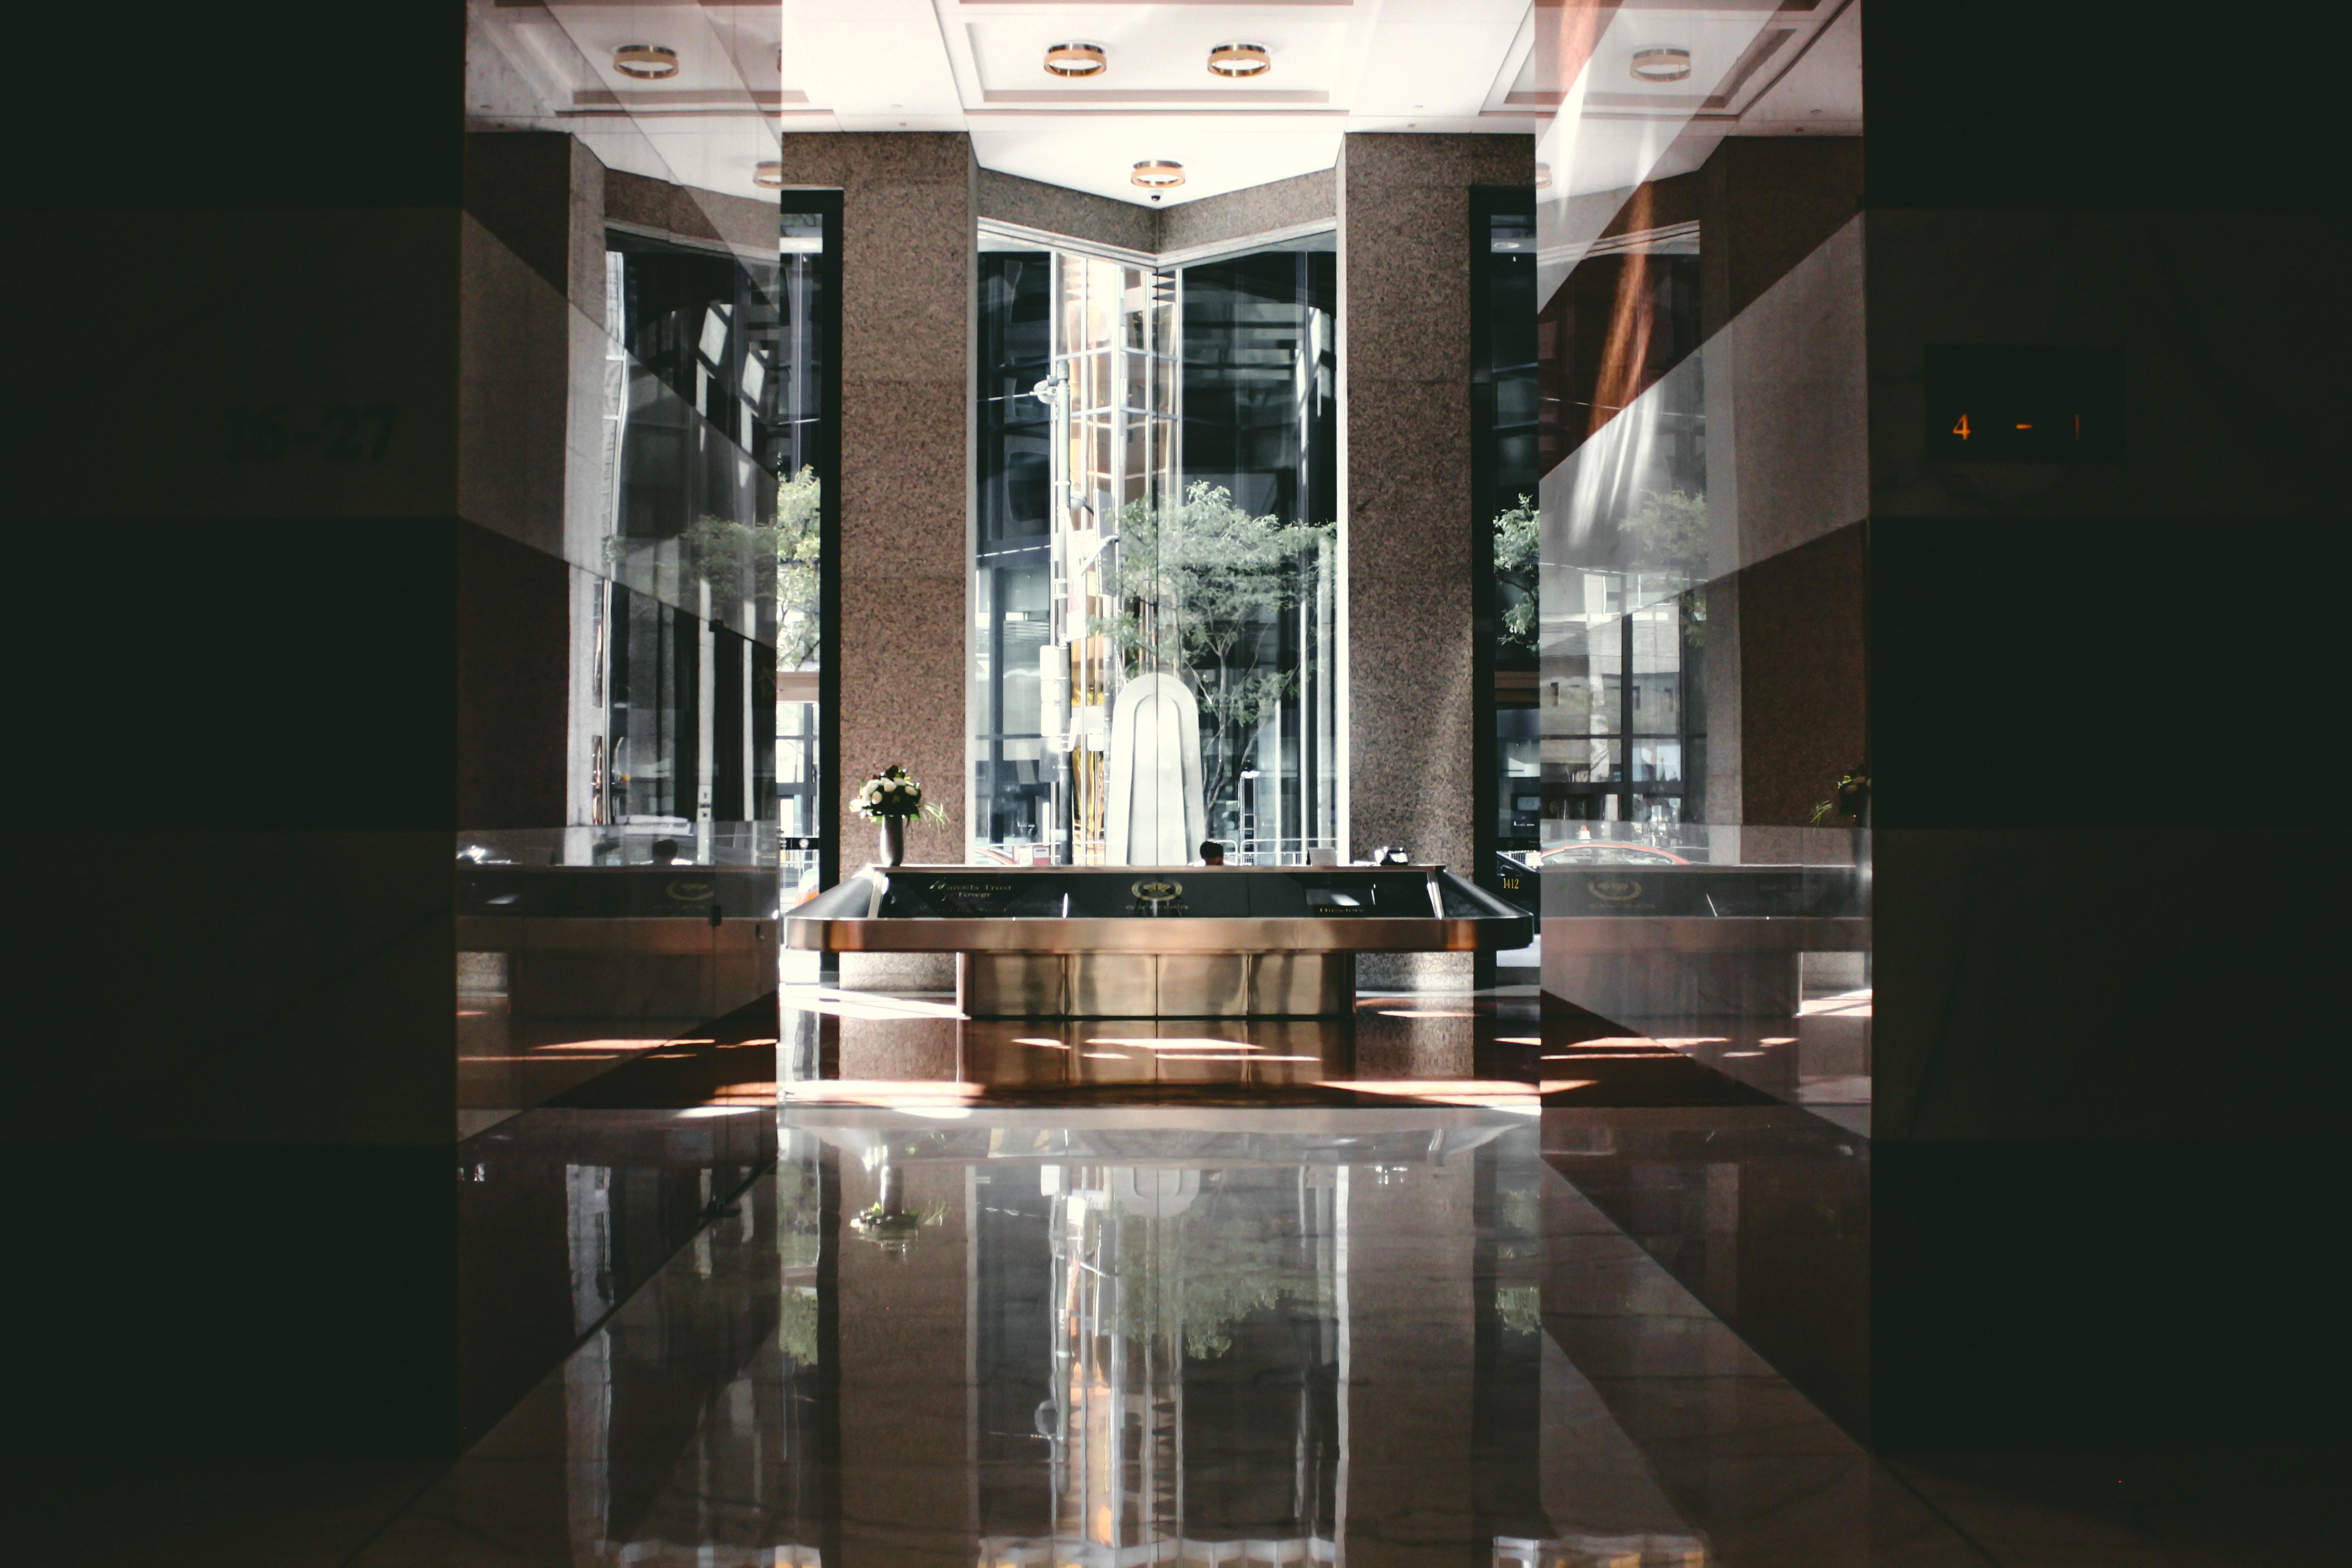 1000+ Luxus Interieur Fotos · Pexels · Kostenlose Stock Fotos